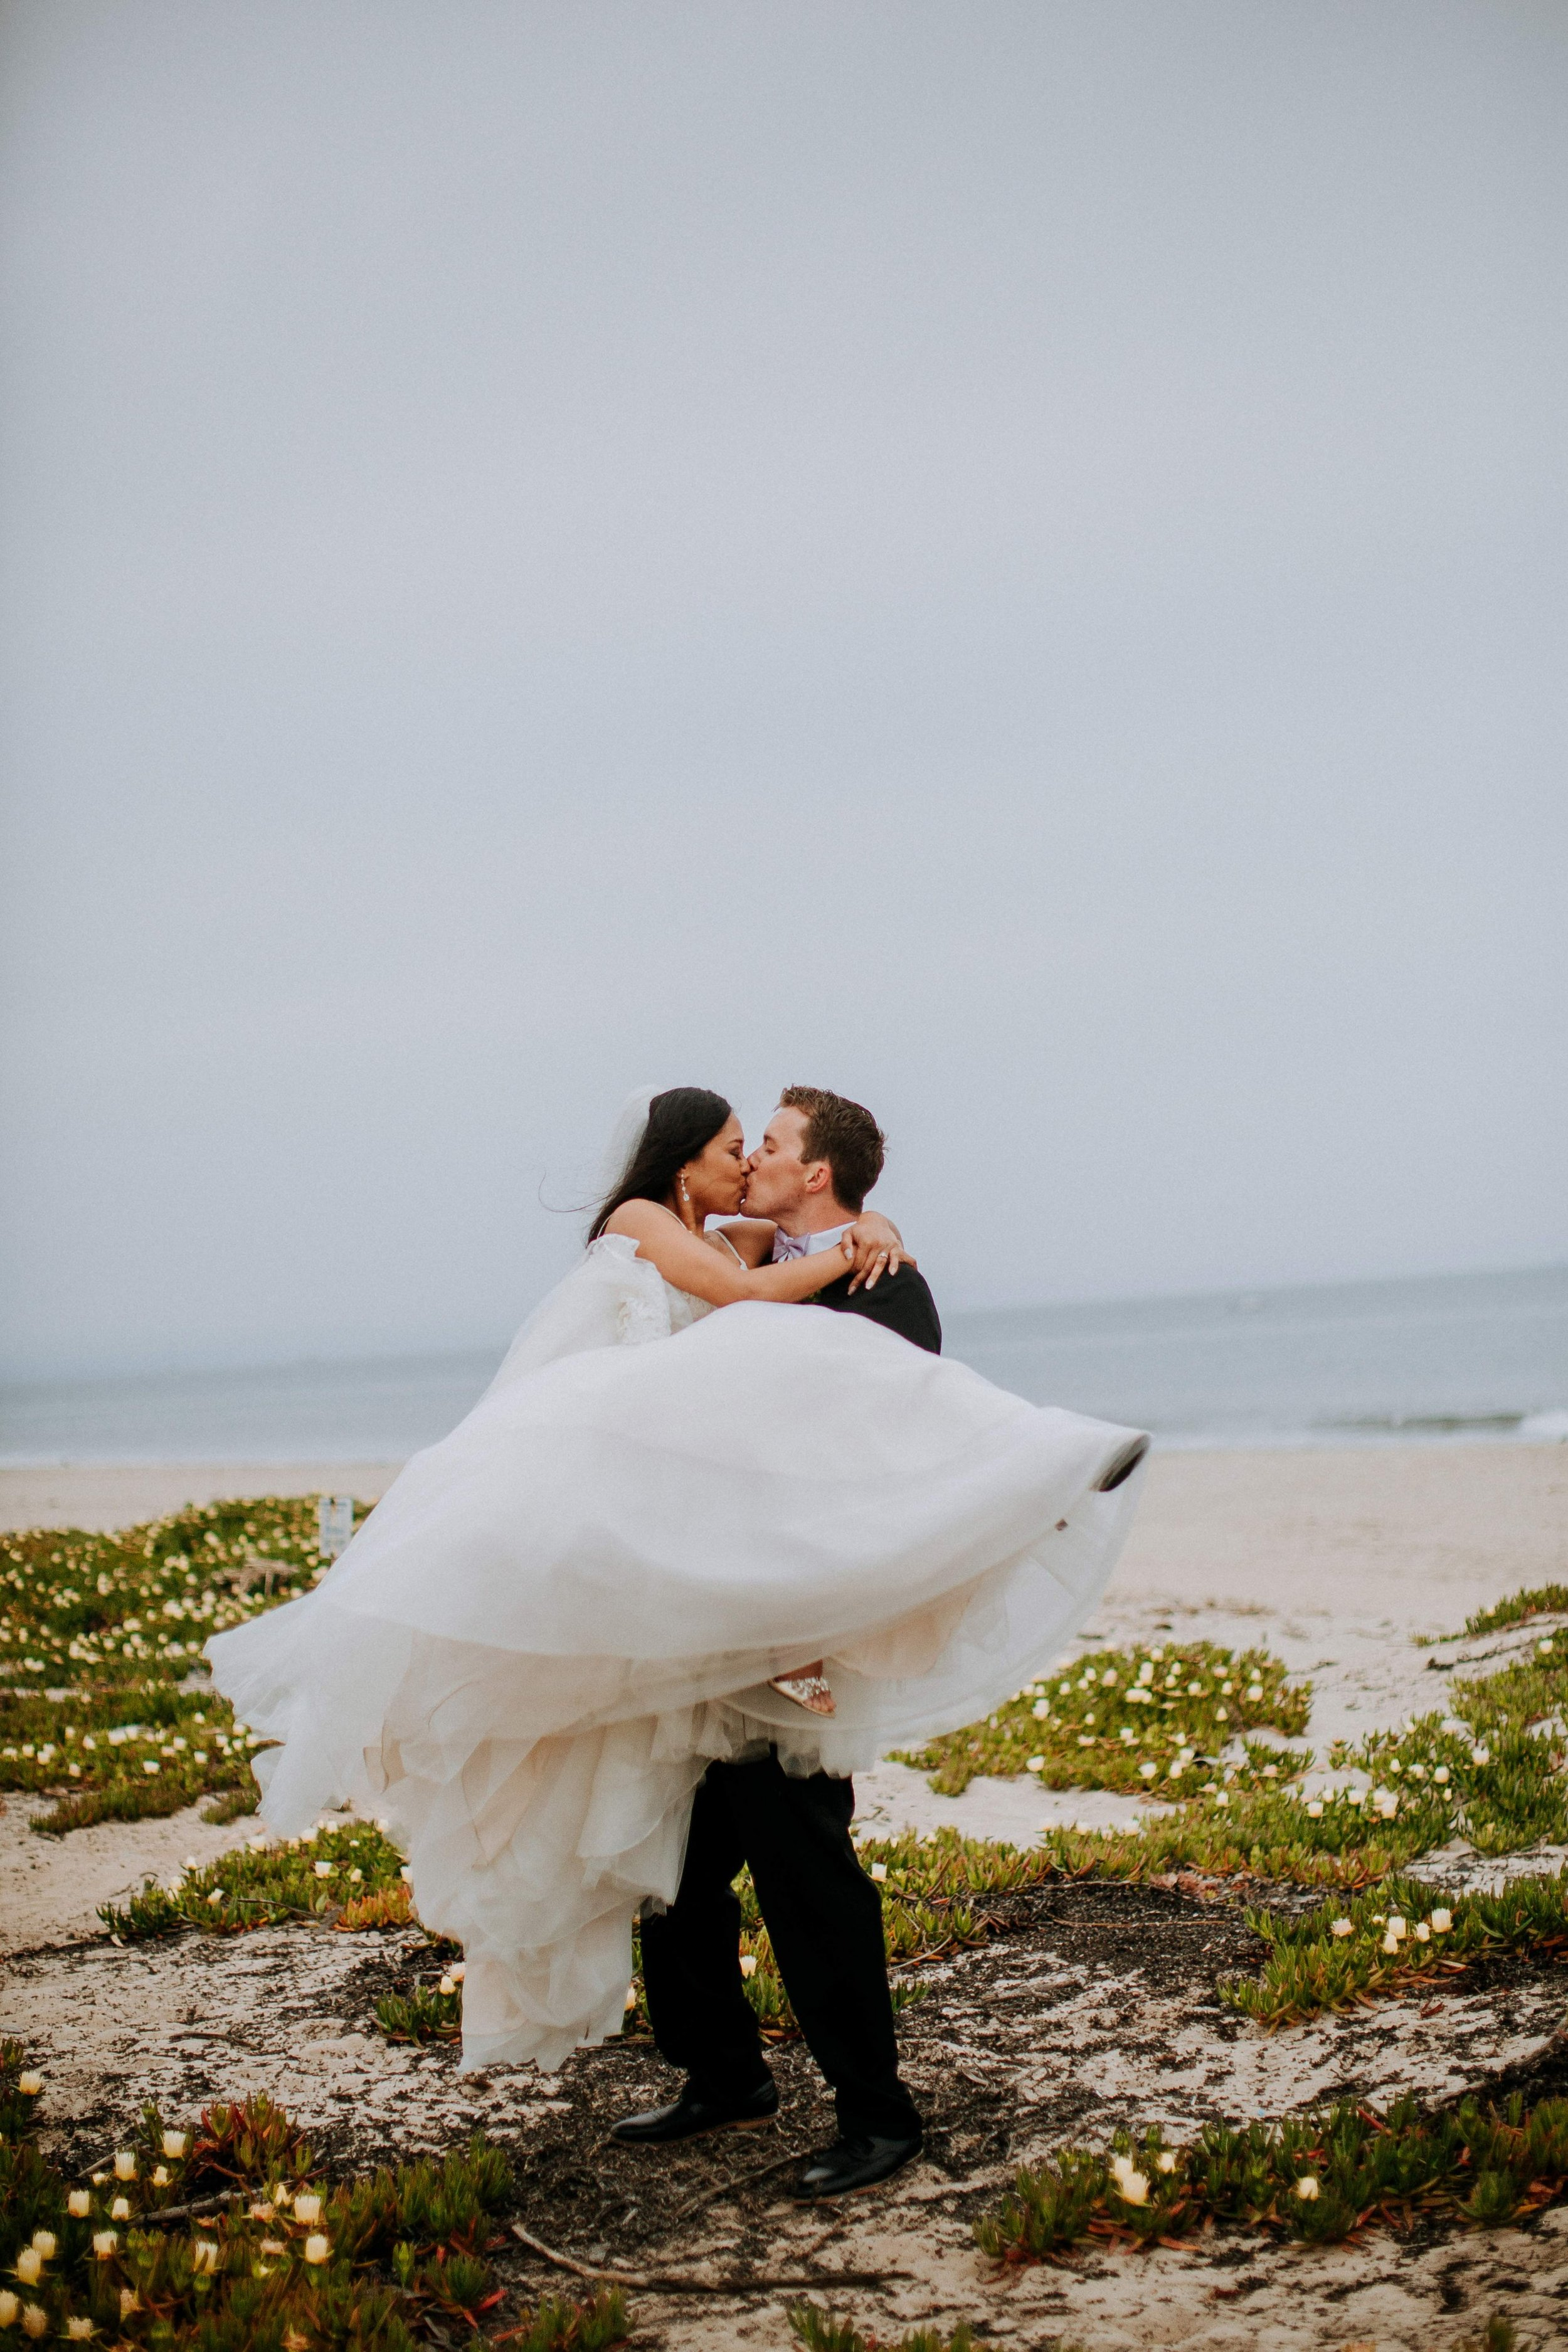 www.santabarbarawedding.com | Candice Marie Photography | Hilton Santa Barbara Beachfront Resort | Dalina Klan | Once in a Lifetime Weddings | Bride and Groom Share a Kiss on the Beach